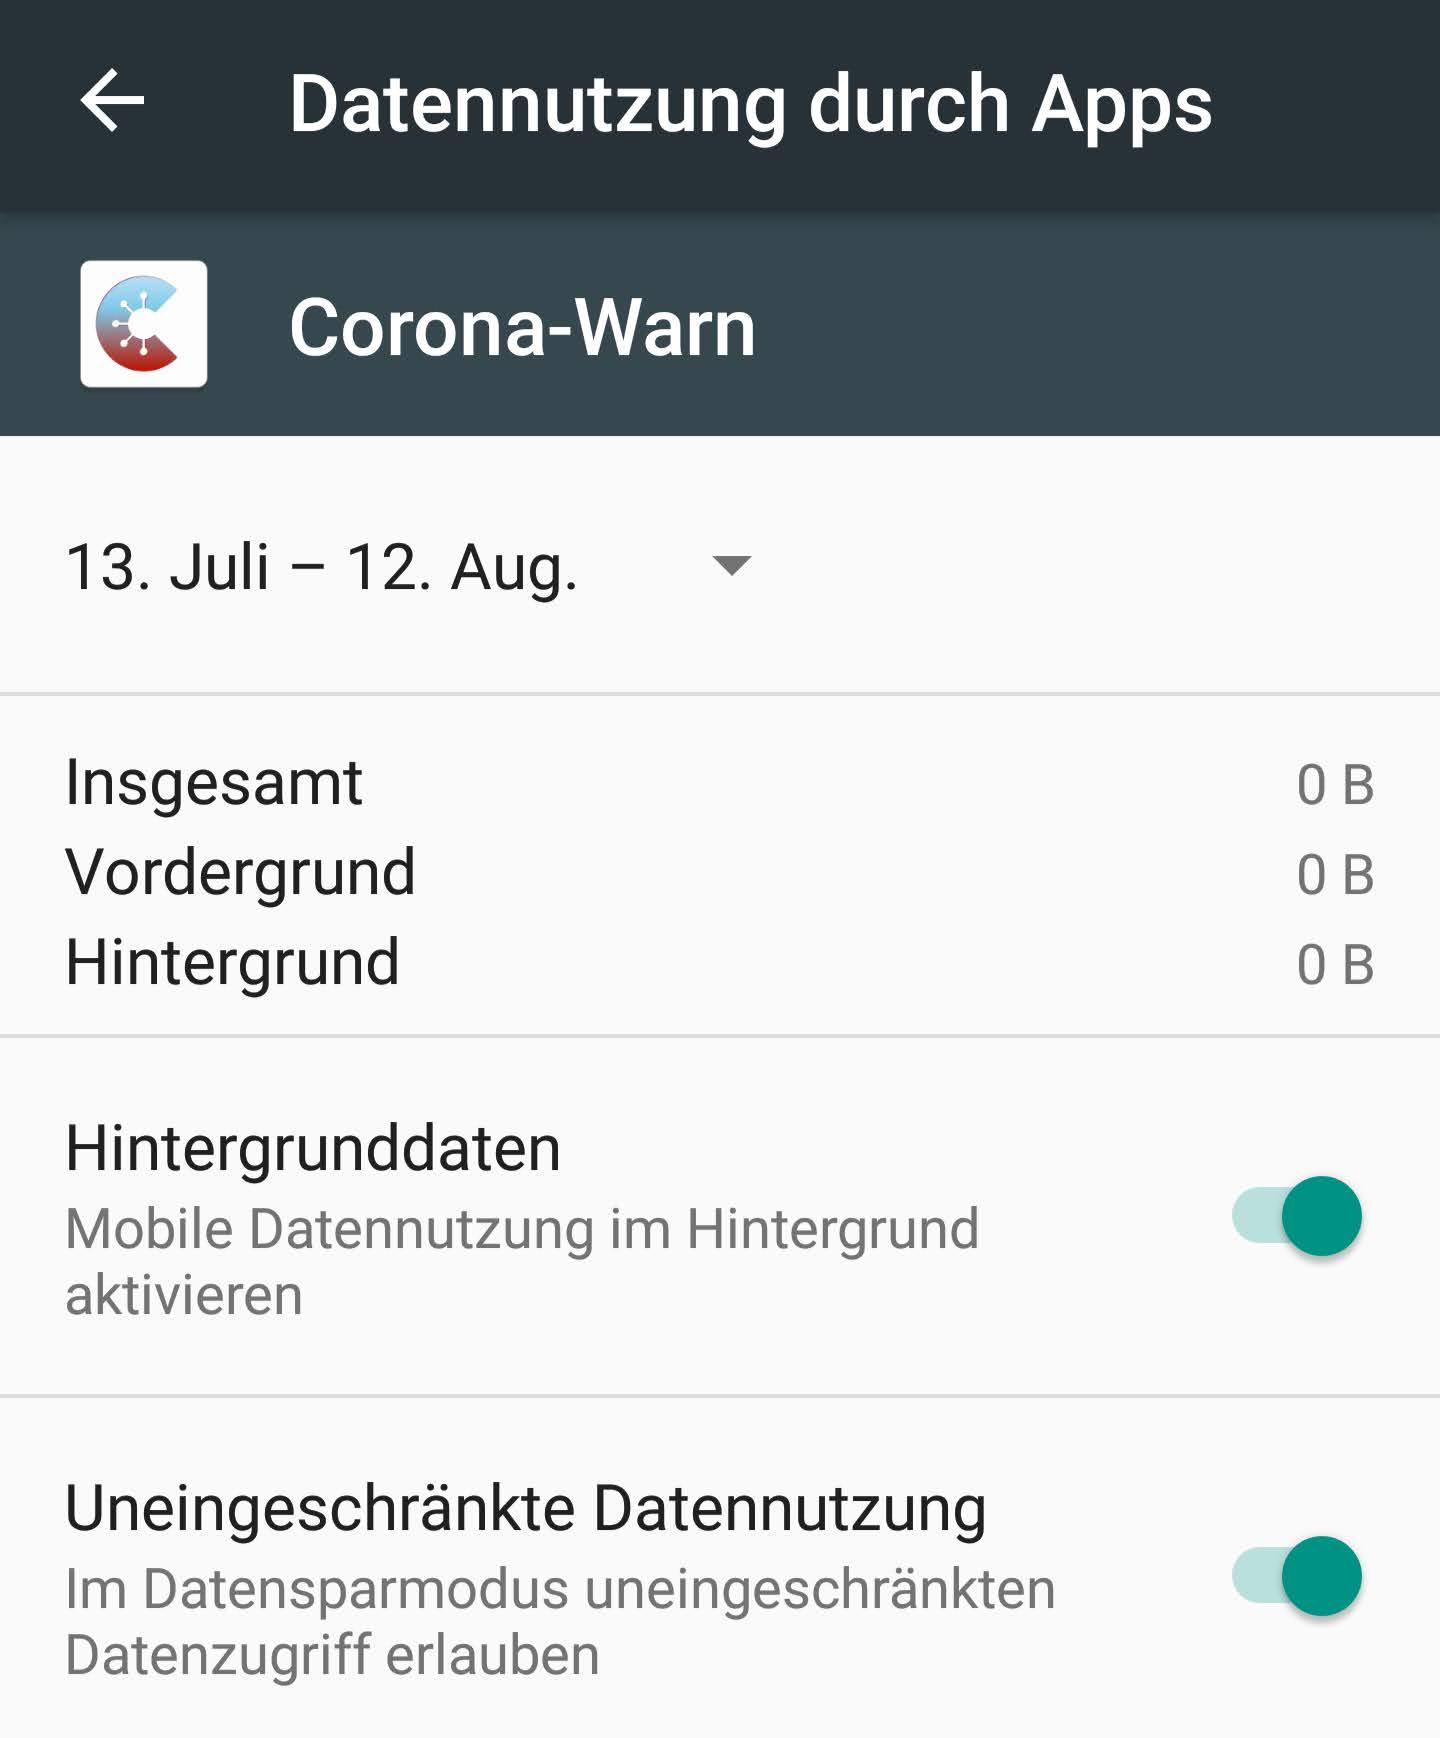 Corona-Warn-App: Hintergrundaktivitäten für Android einschalten